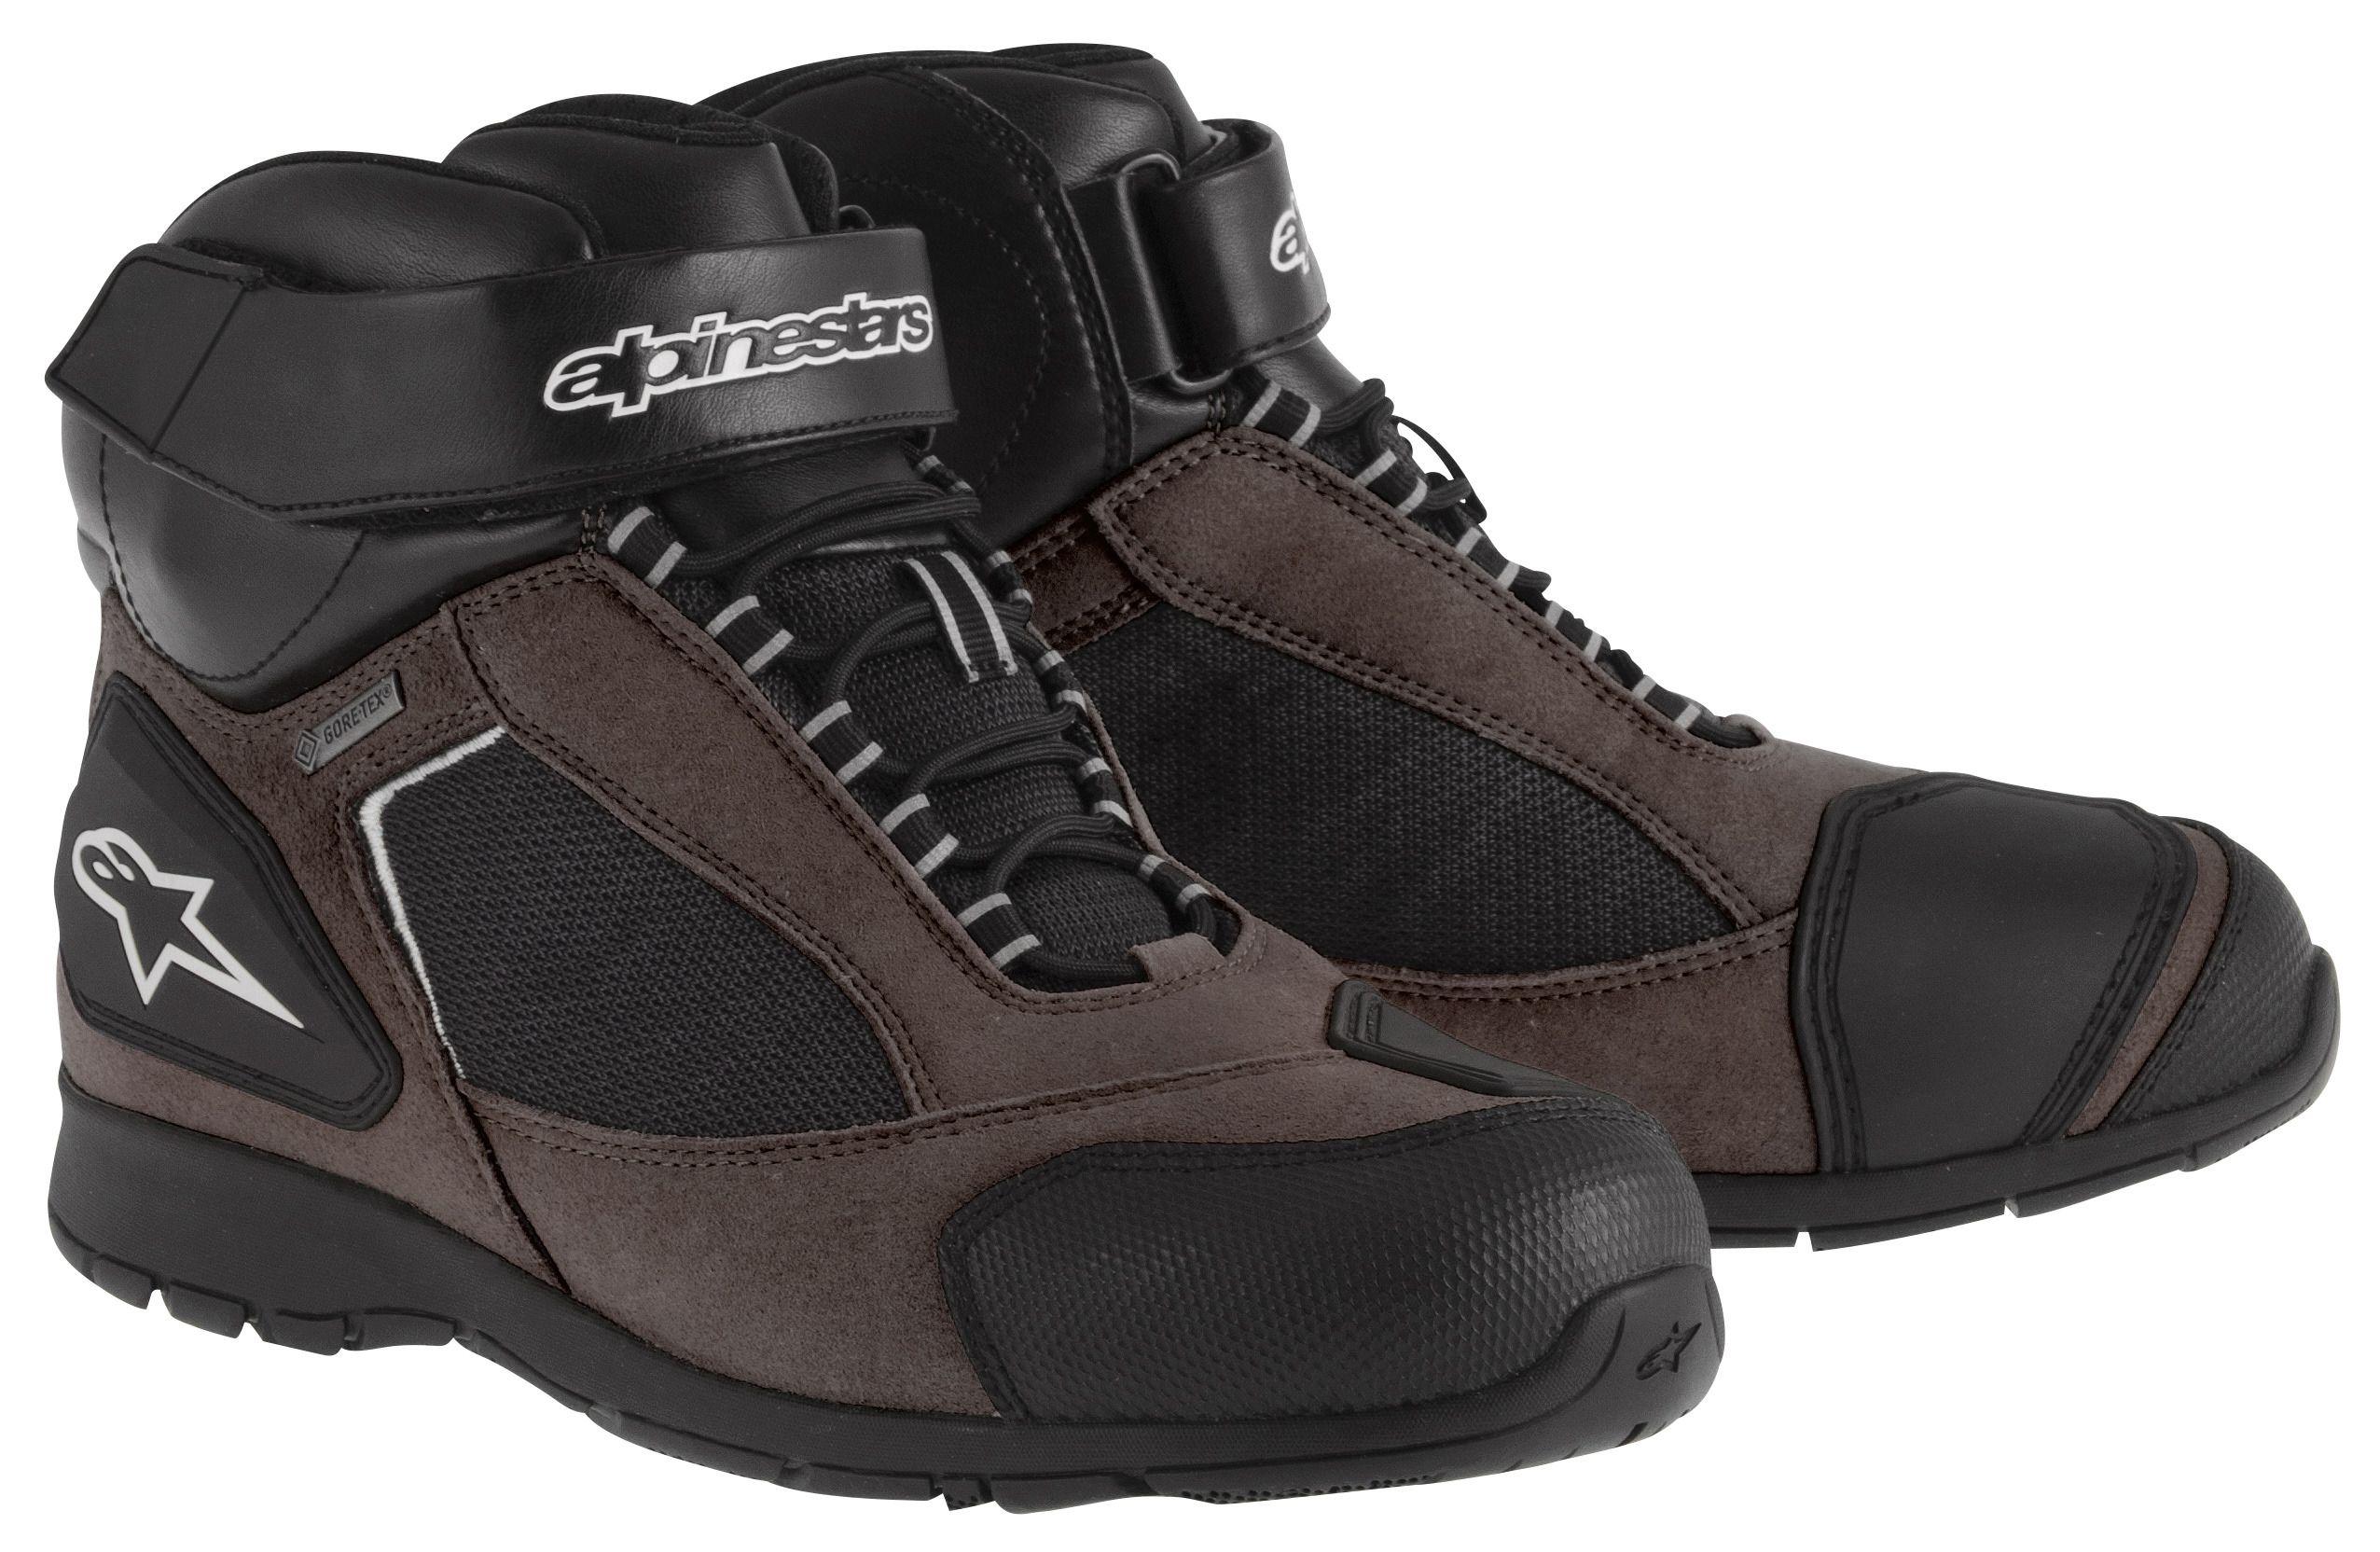 Alpinestars Sierra Gore-Tex XCR Boots (Size 6.5 Only) - RevZilla